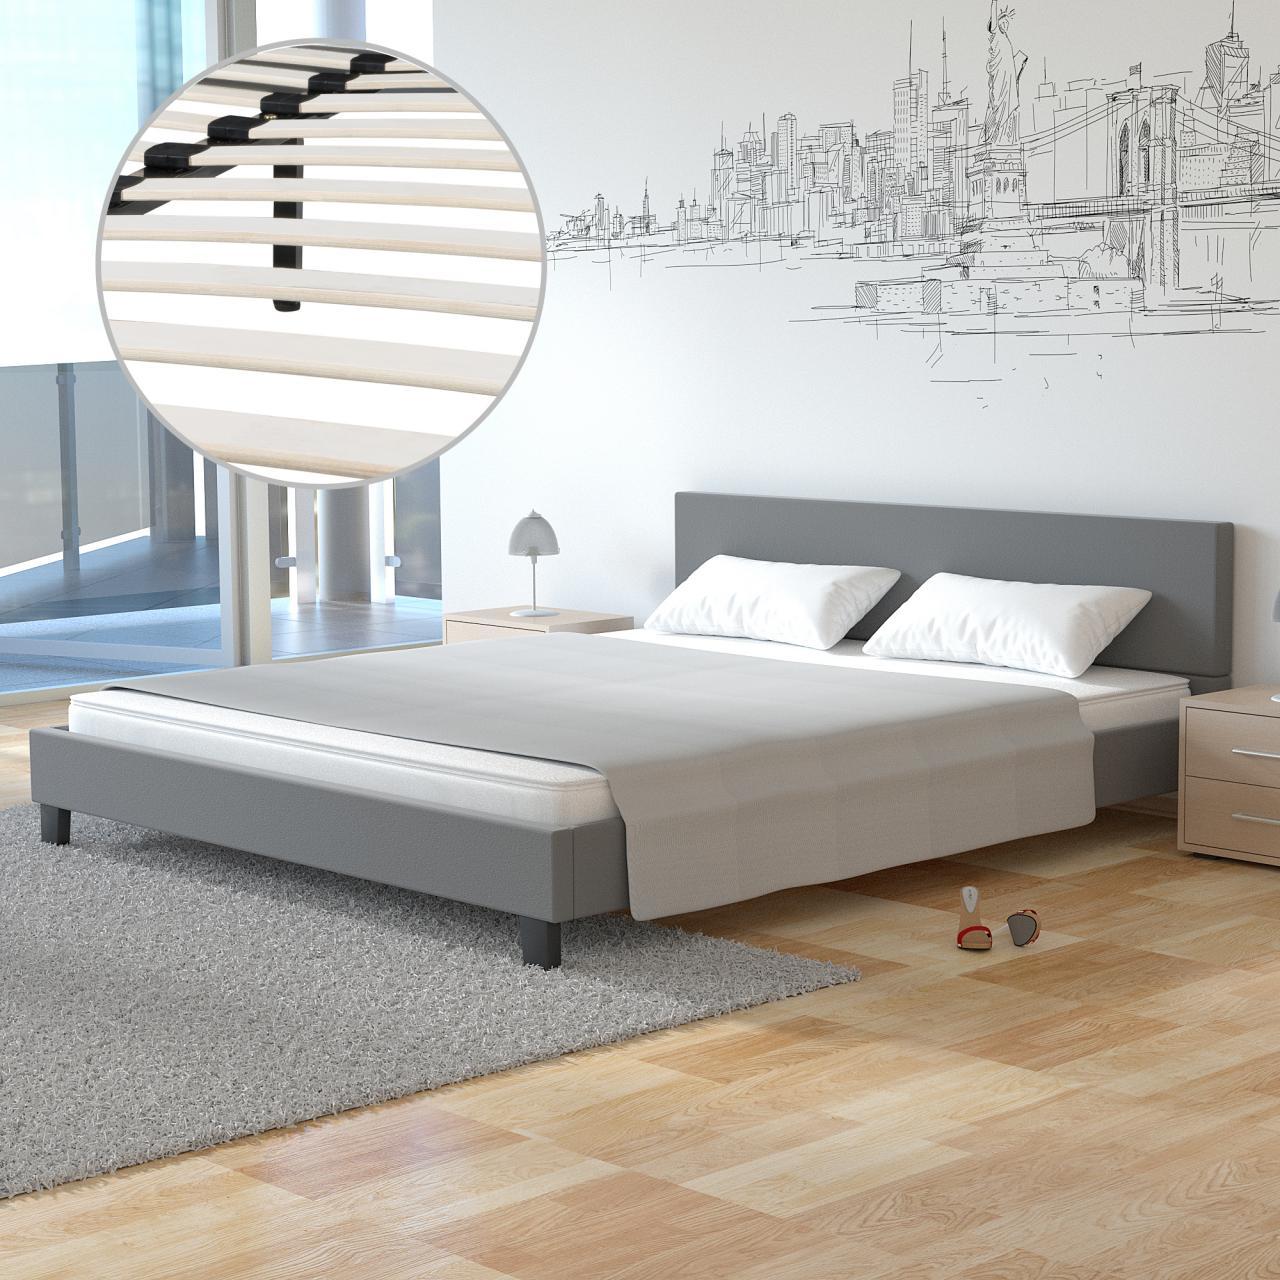 polsterbett doppelbett design bettgestell bettrahmen mit lattenrost bett ebay. Black Bedroom Furniture Sets. Home Design Ideas